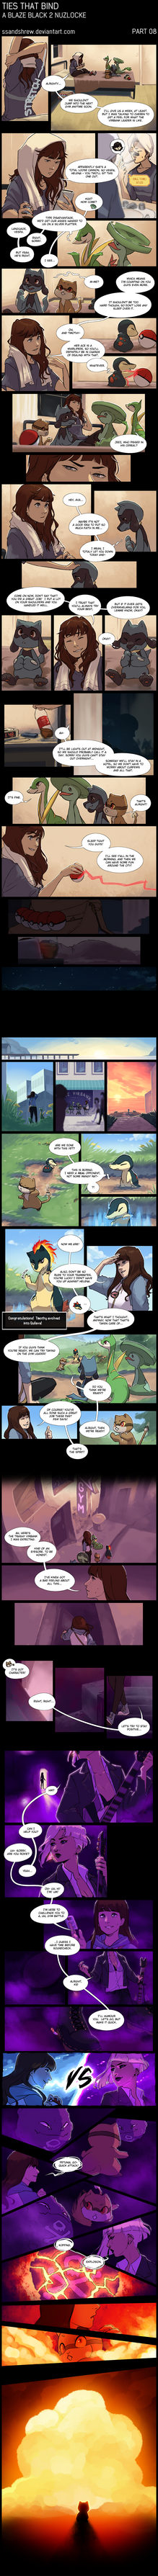 Ties that Bind - Page 8